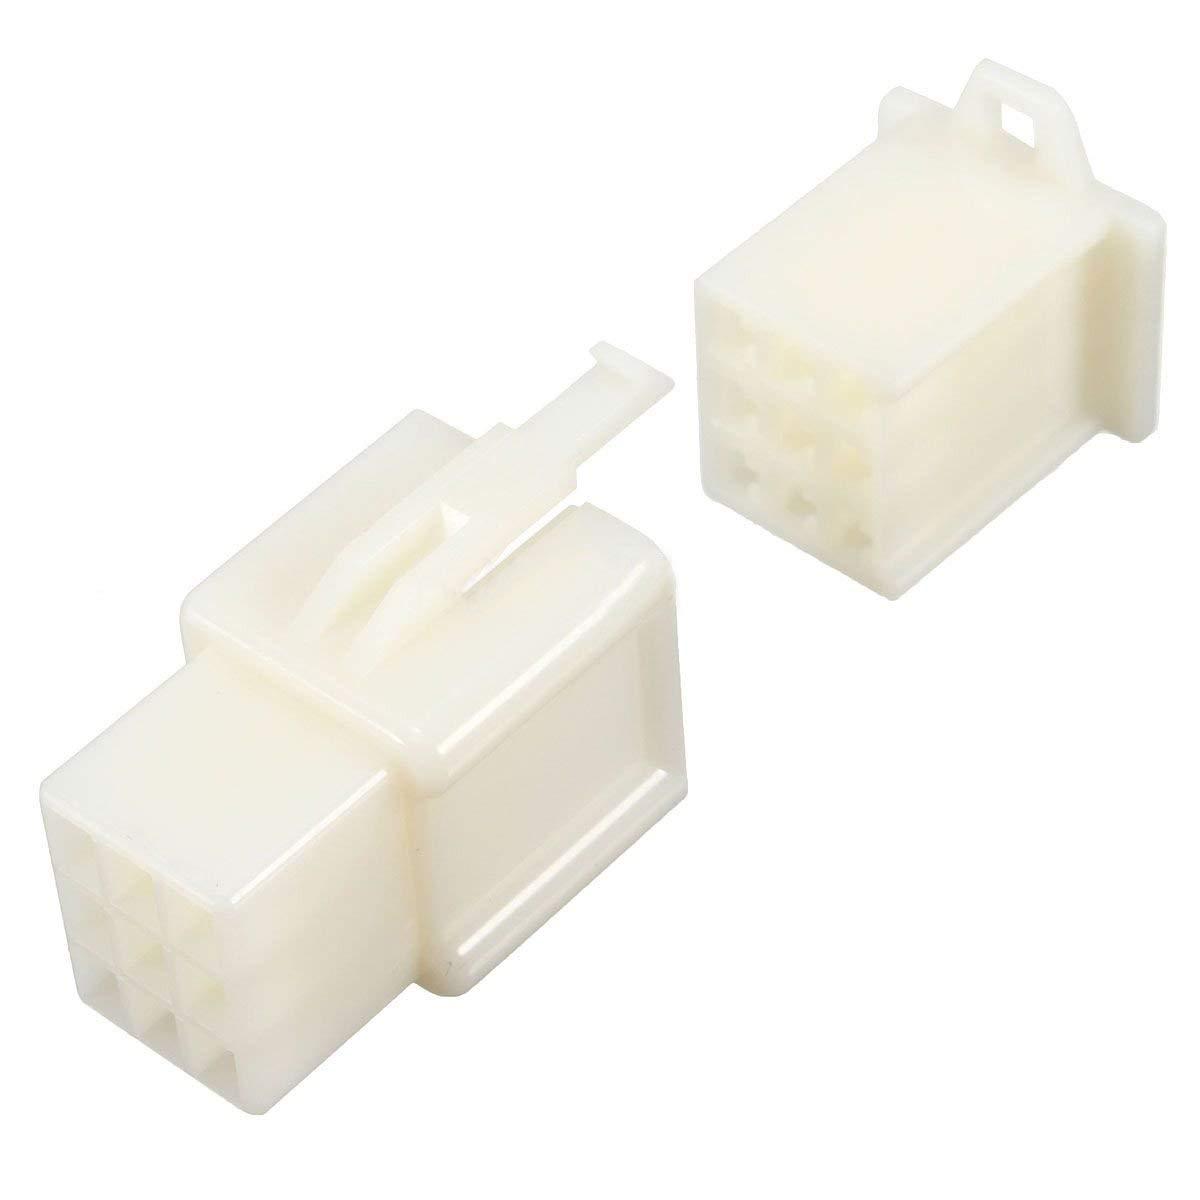 Anschluss 5 x 9 Kan/äle 2,8 mm Mini Verbinder Set f/ür Auto Motorrad Pin Terminal Blende ATV wei/ß